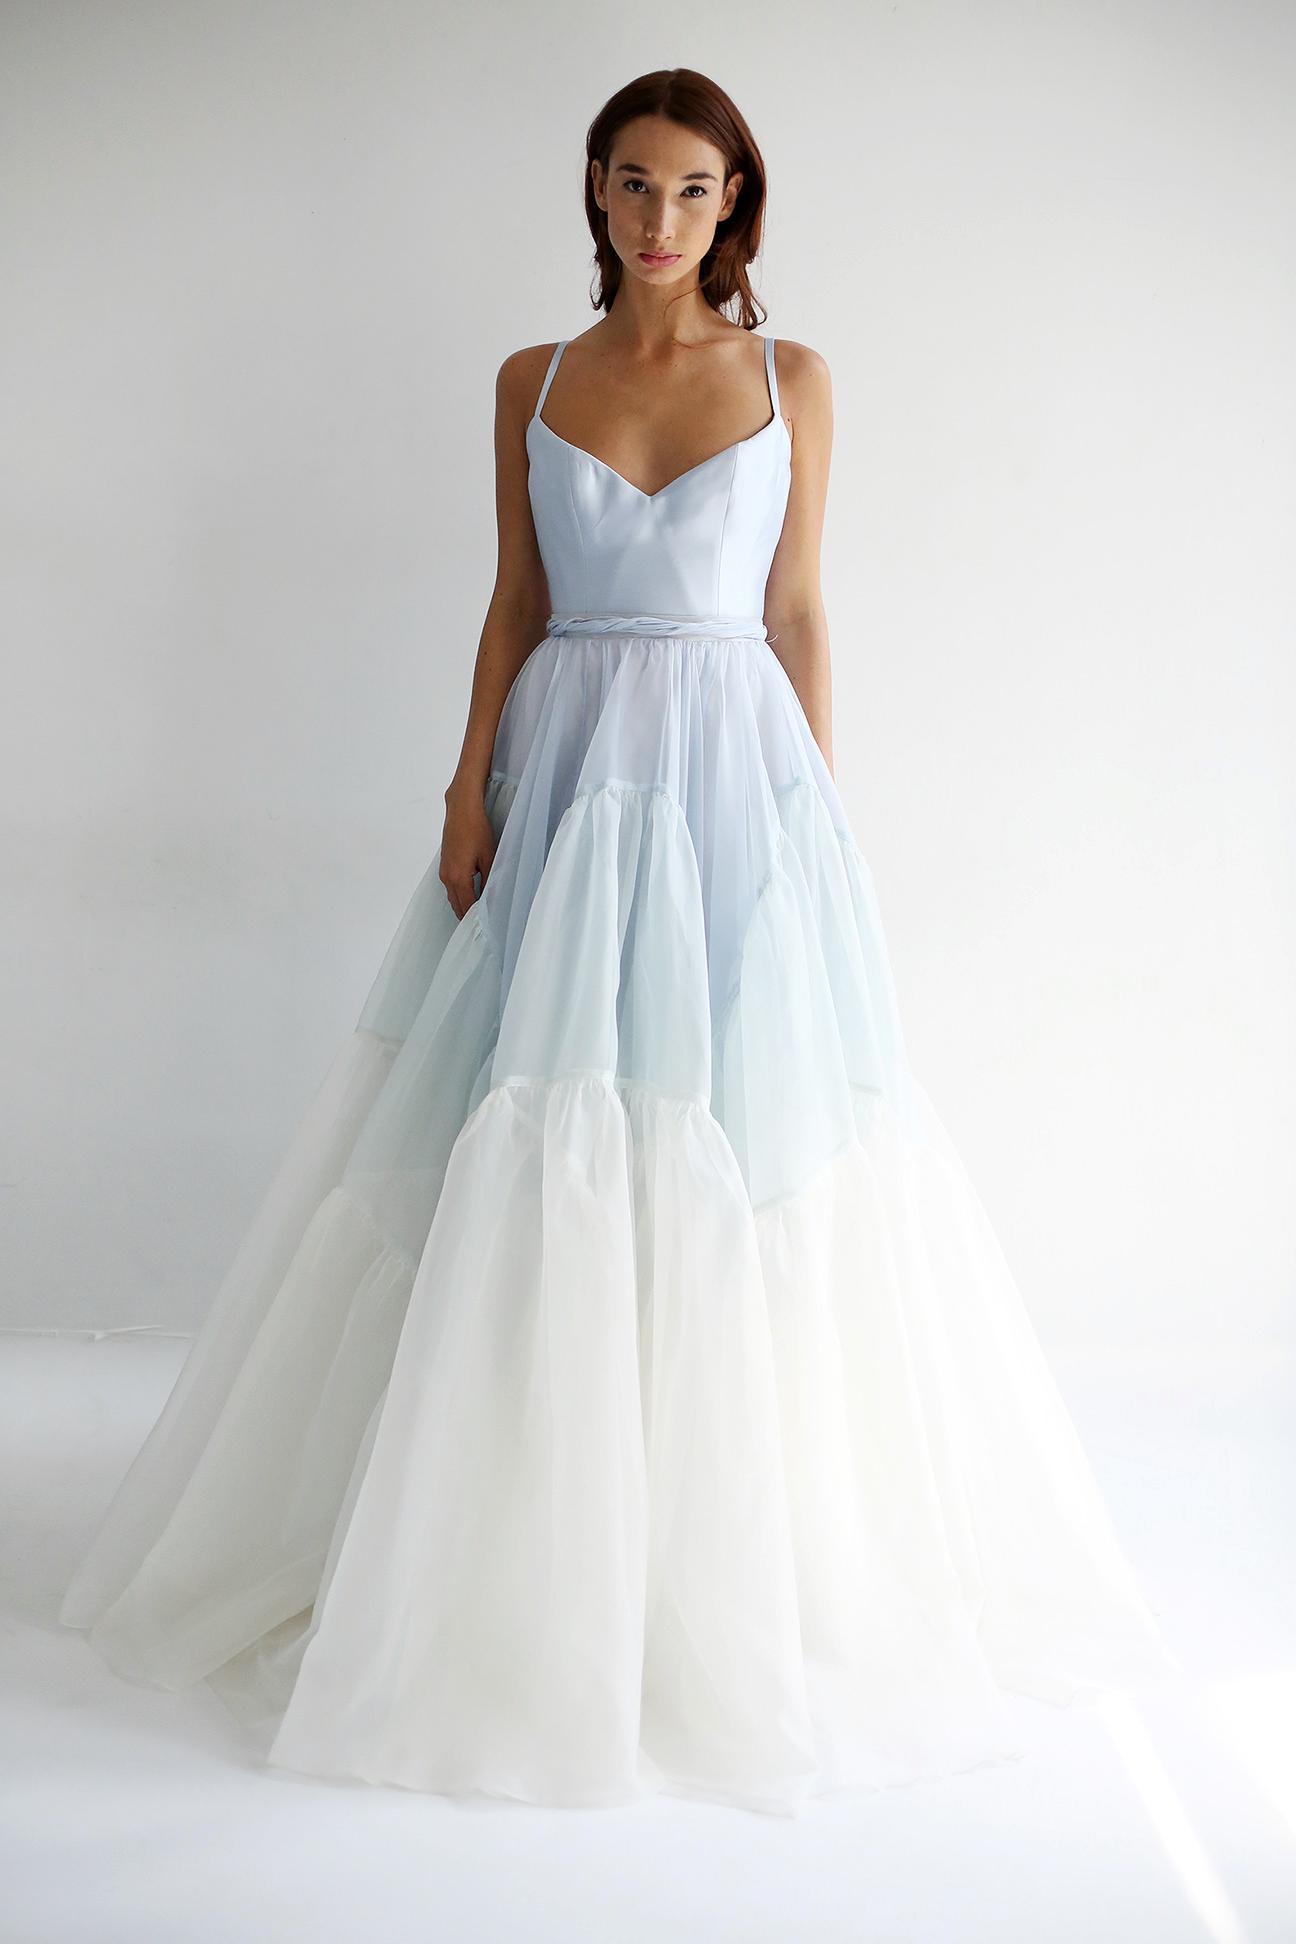 leanne marshall wedding dress spring 2019 spaghetti strap ruffles a-line blue